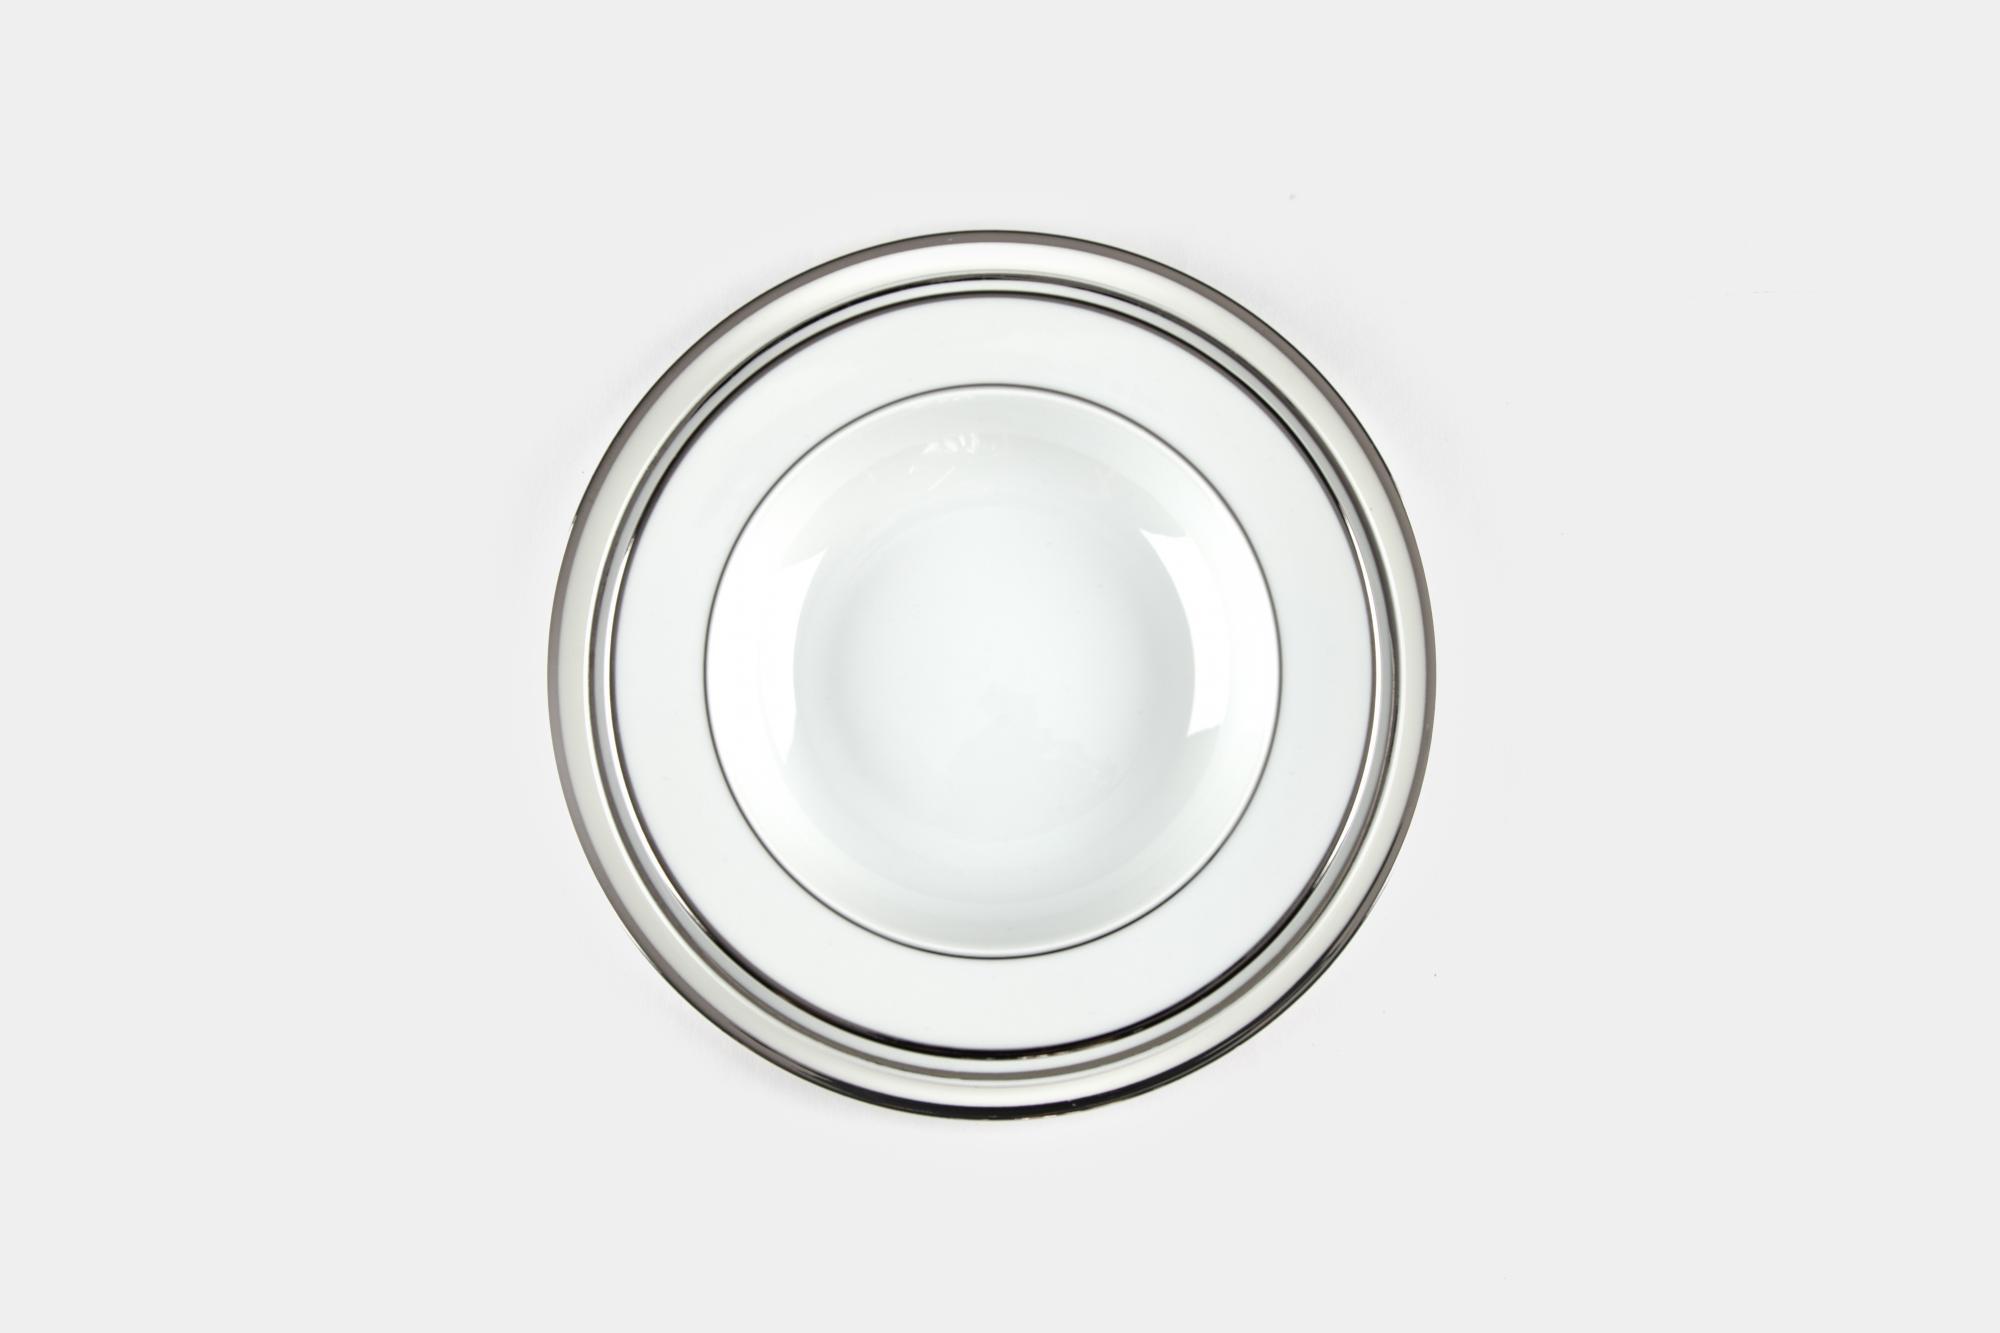 Ionia plate set - Image 2